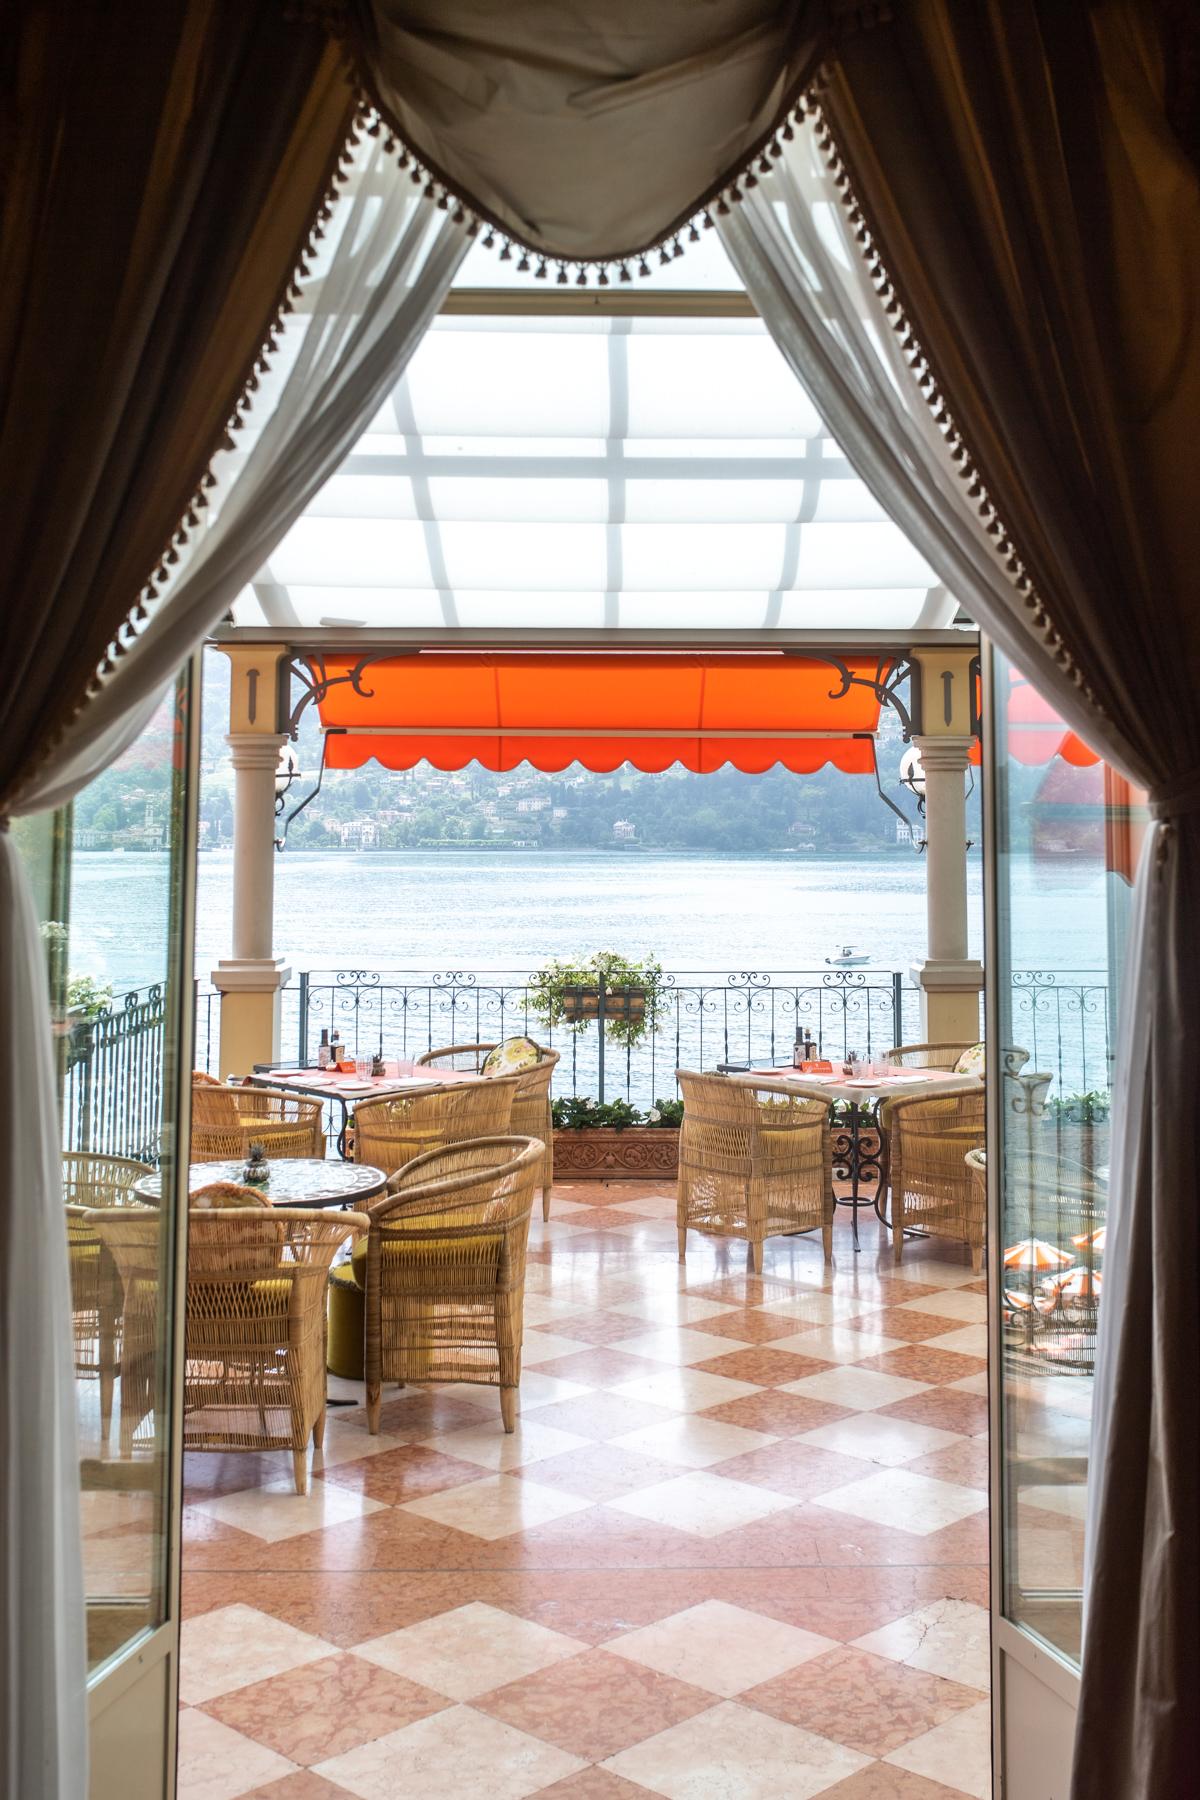 Stacie Flinner x Grand Hotel Tremezzo x Maupin Travel-50.jpg